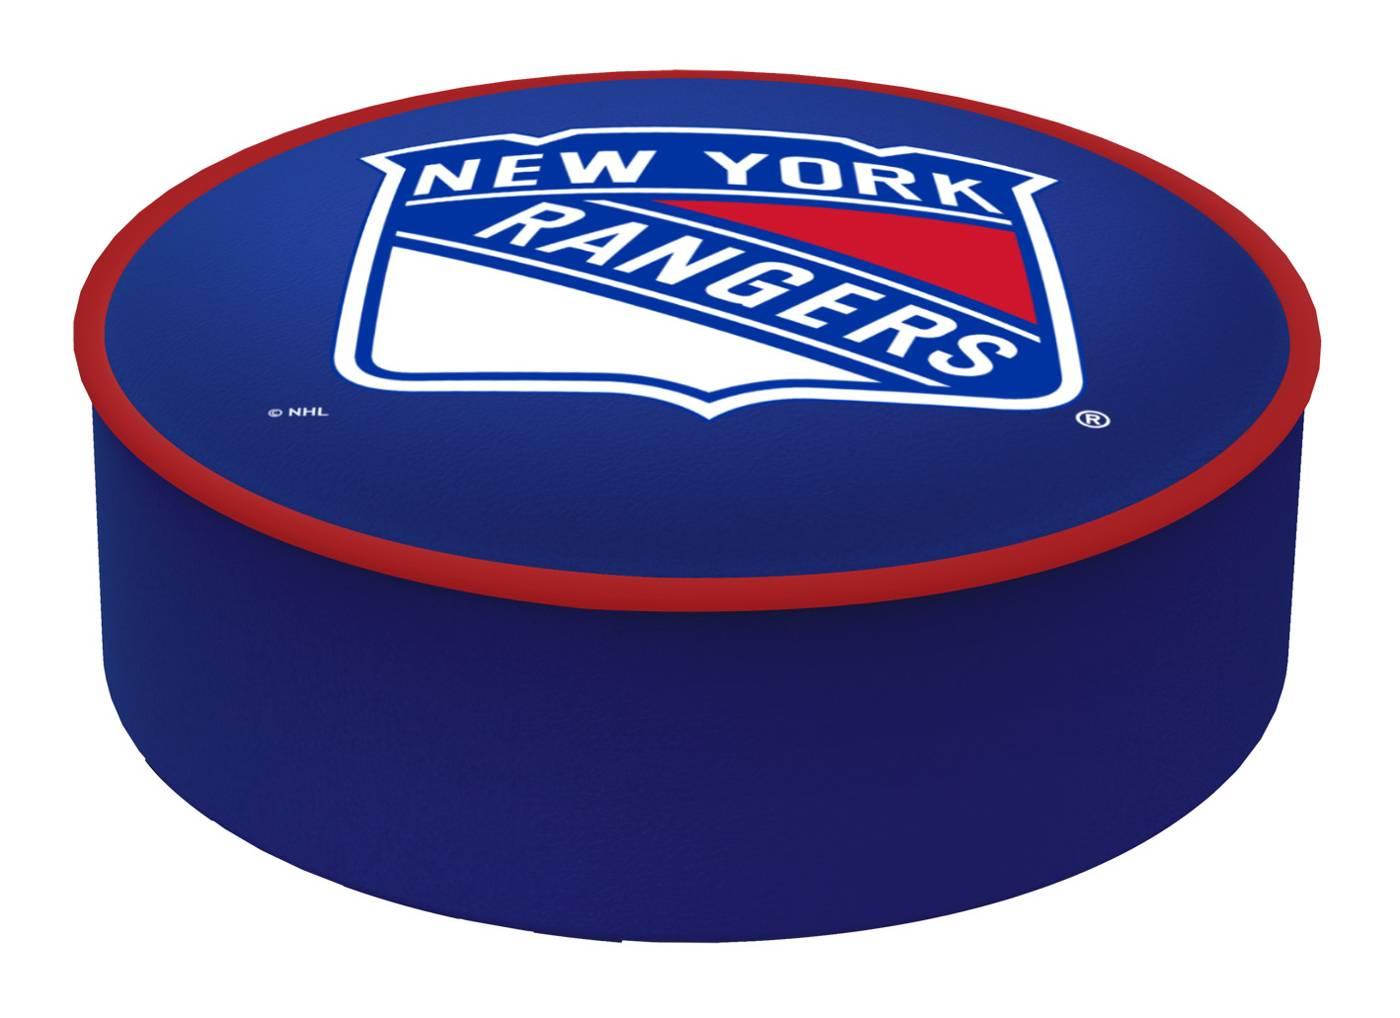 New York Rangers Bar Stool Seat Cover : new york rangers bar stool seat covermainProductImageFullSize from www.sportsunlimitedinc.com size 1000 x 833 jpeg 73kB